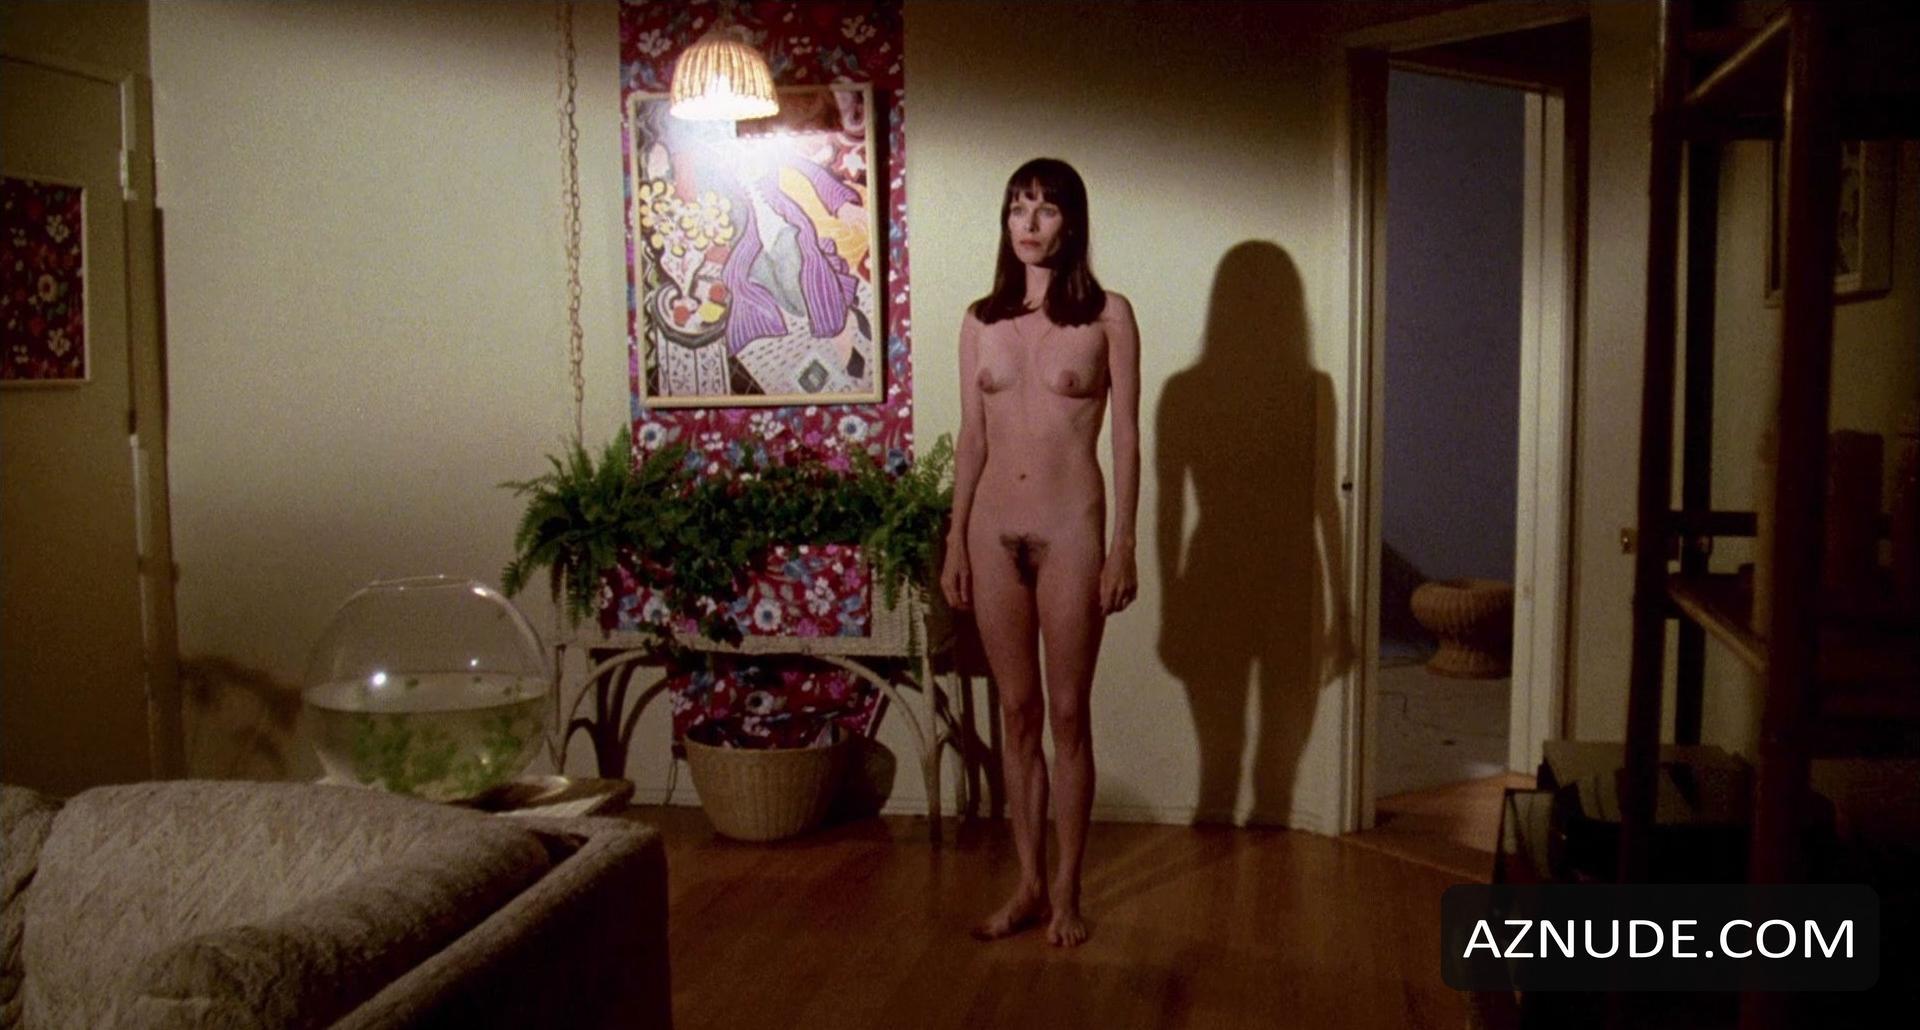 Geraldine chaplin dominique sanda nude 1980 - 1 part 1